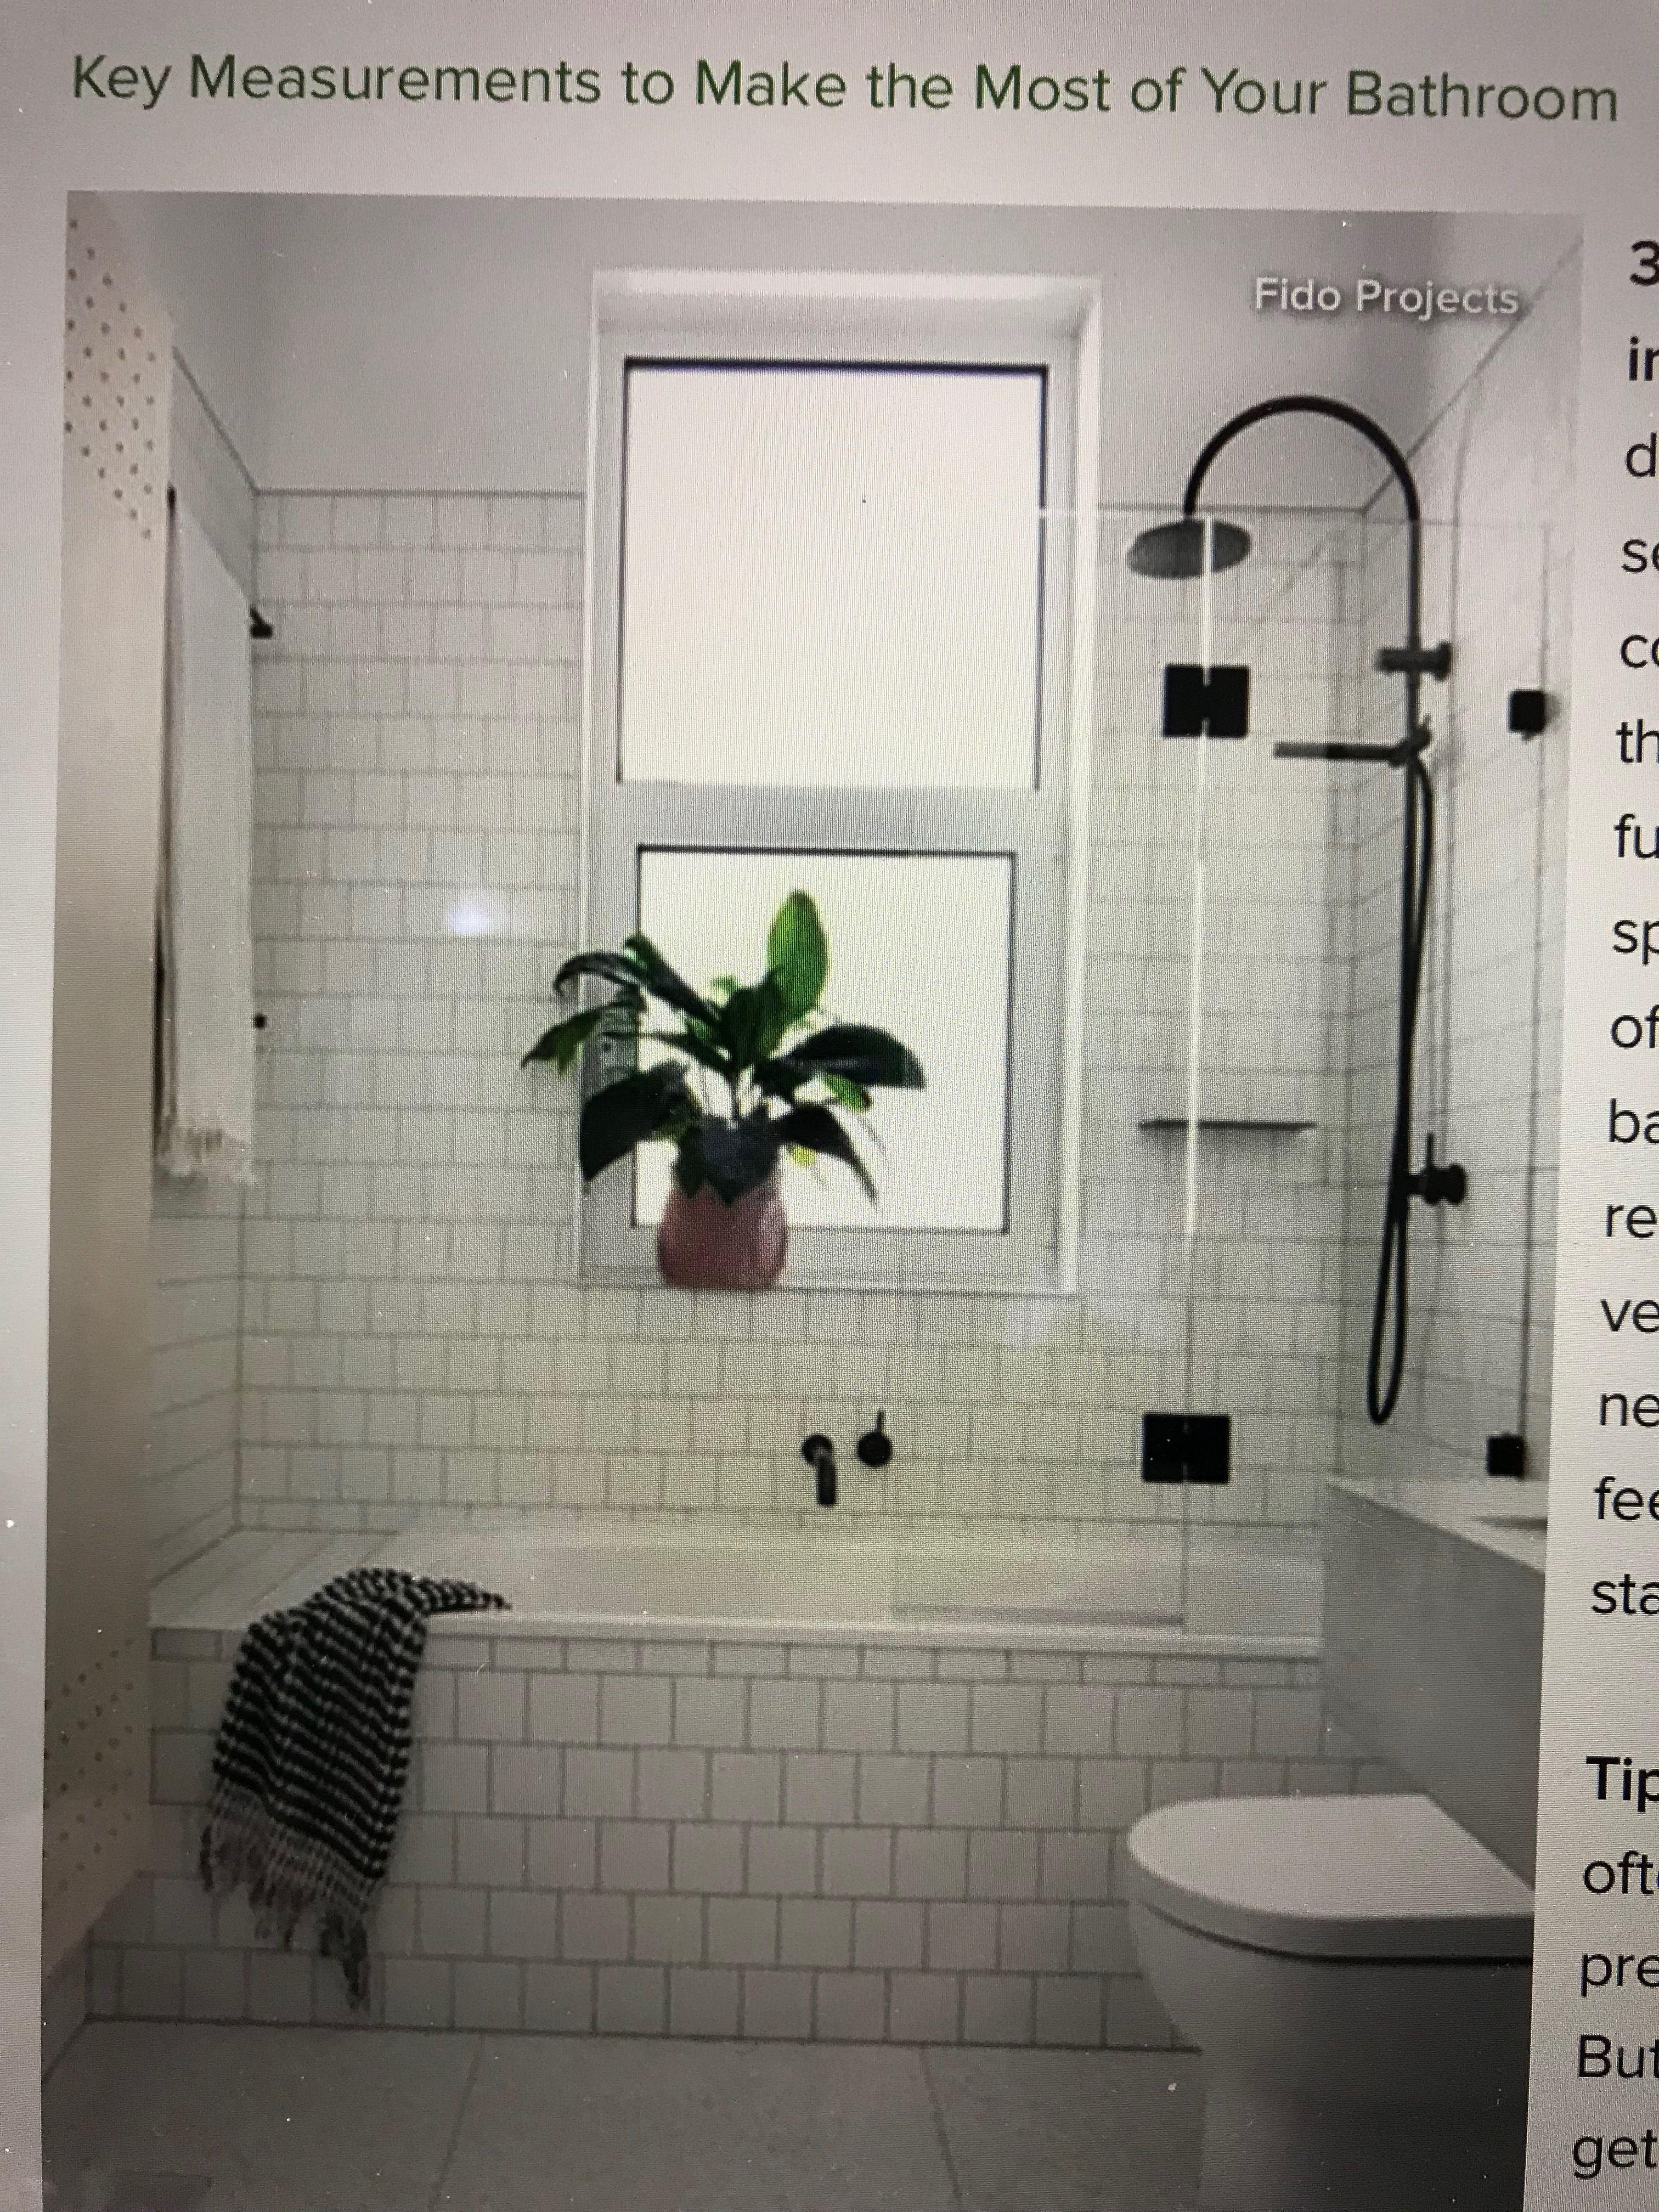 witte tegels in de badkamers kleine badkamer verbouwen kleine badkamer ontwerpen kleine badkamers